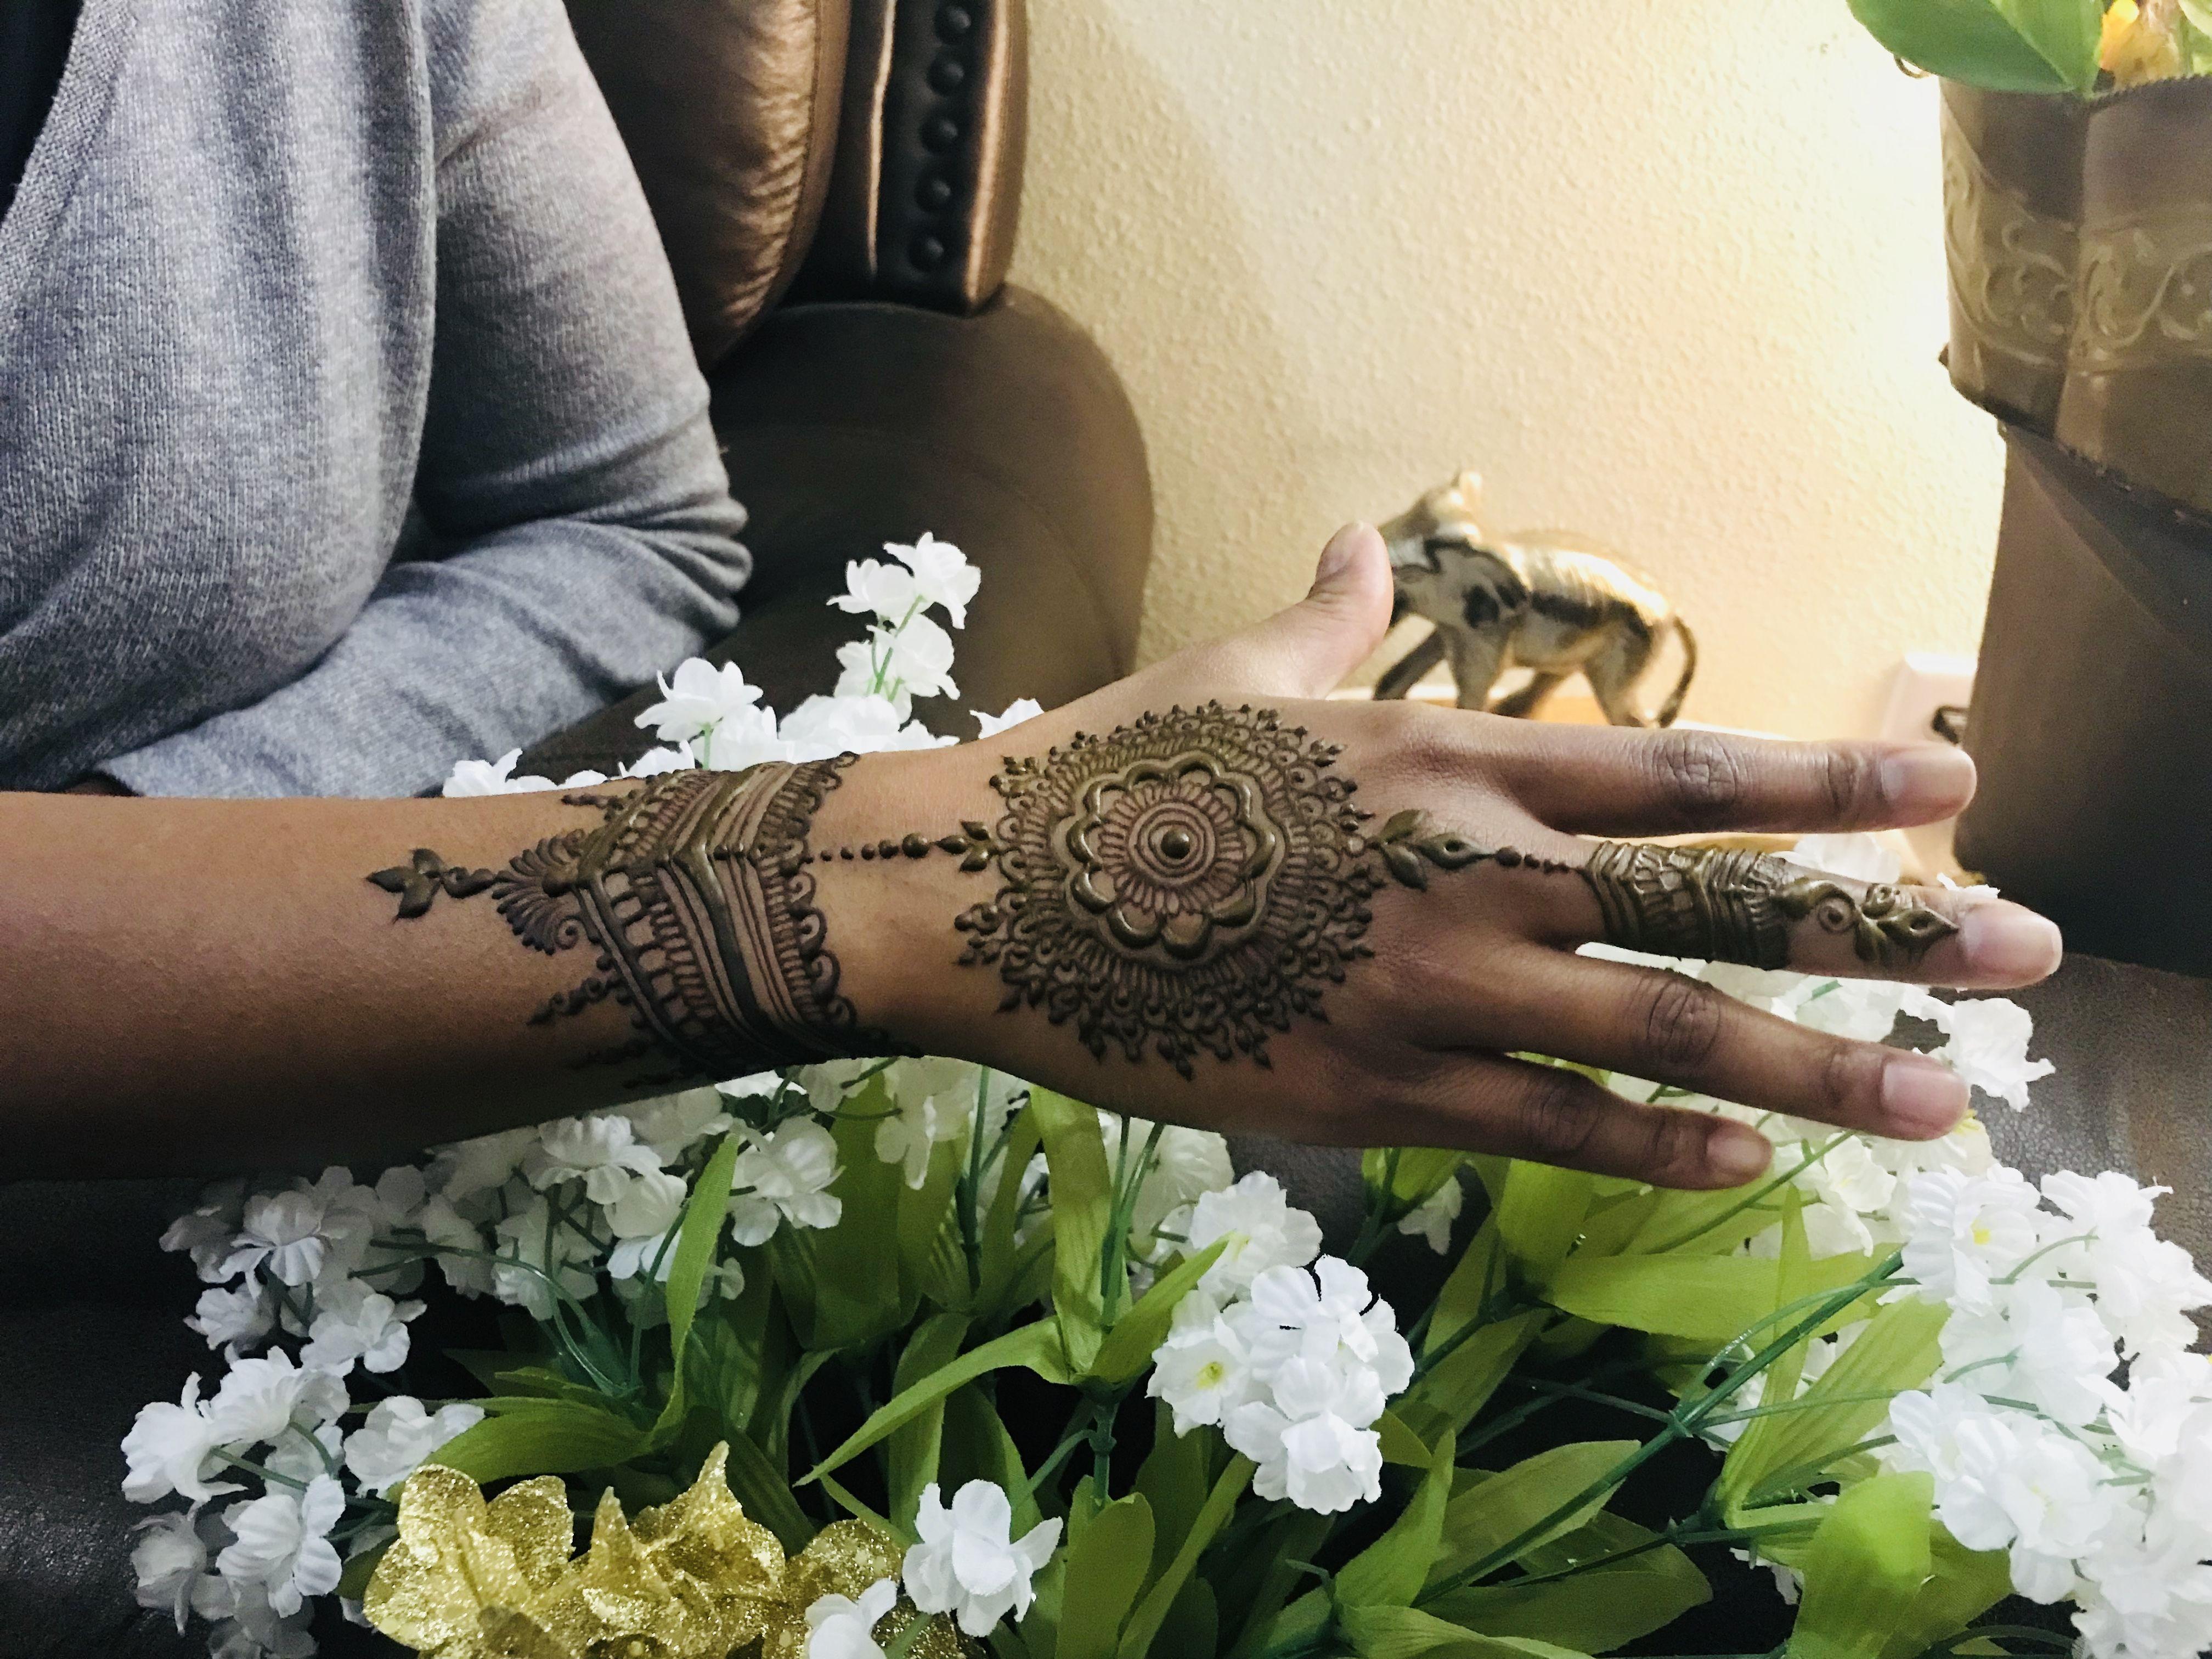 Henna Mehndi Love : Henna #usa #art #mehndi #love #beautiful #wedding #awesome #creative